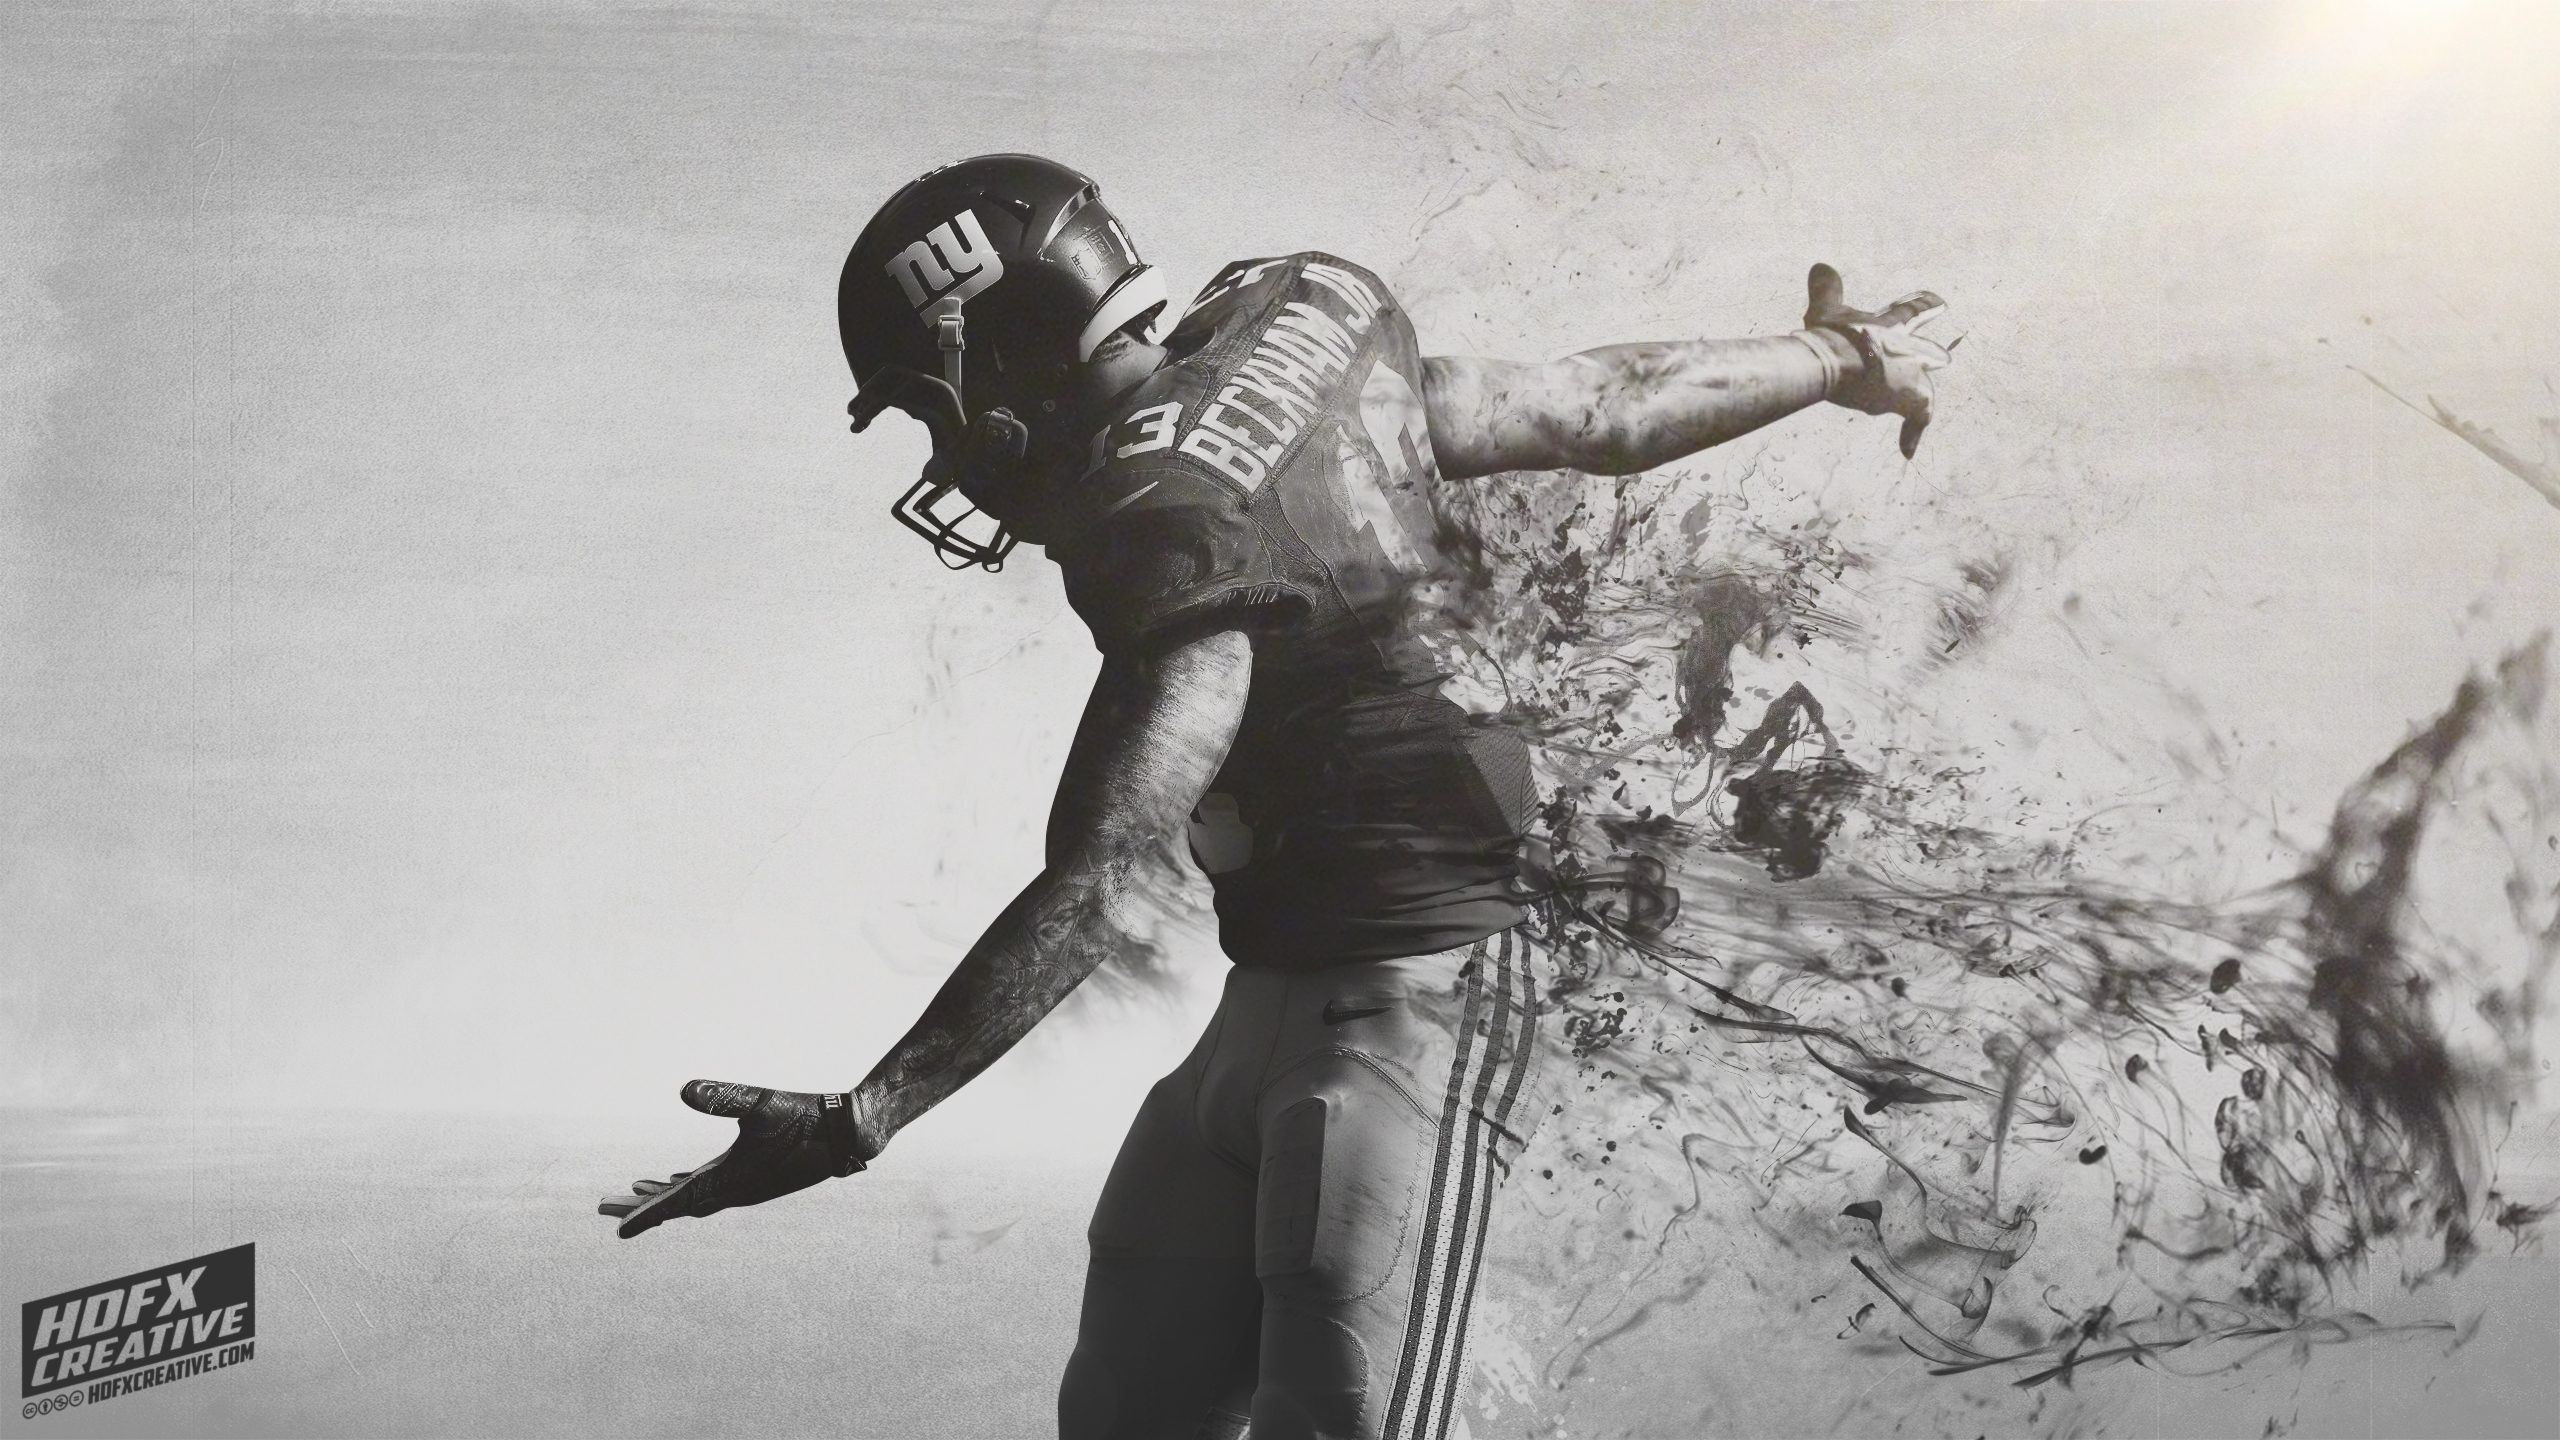 NFL Wallpapers HDFX CREATIVE 2560x1440